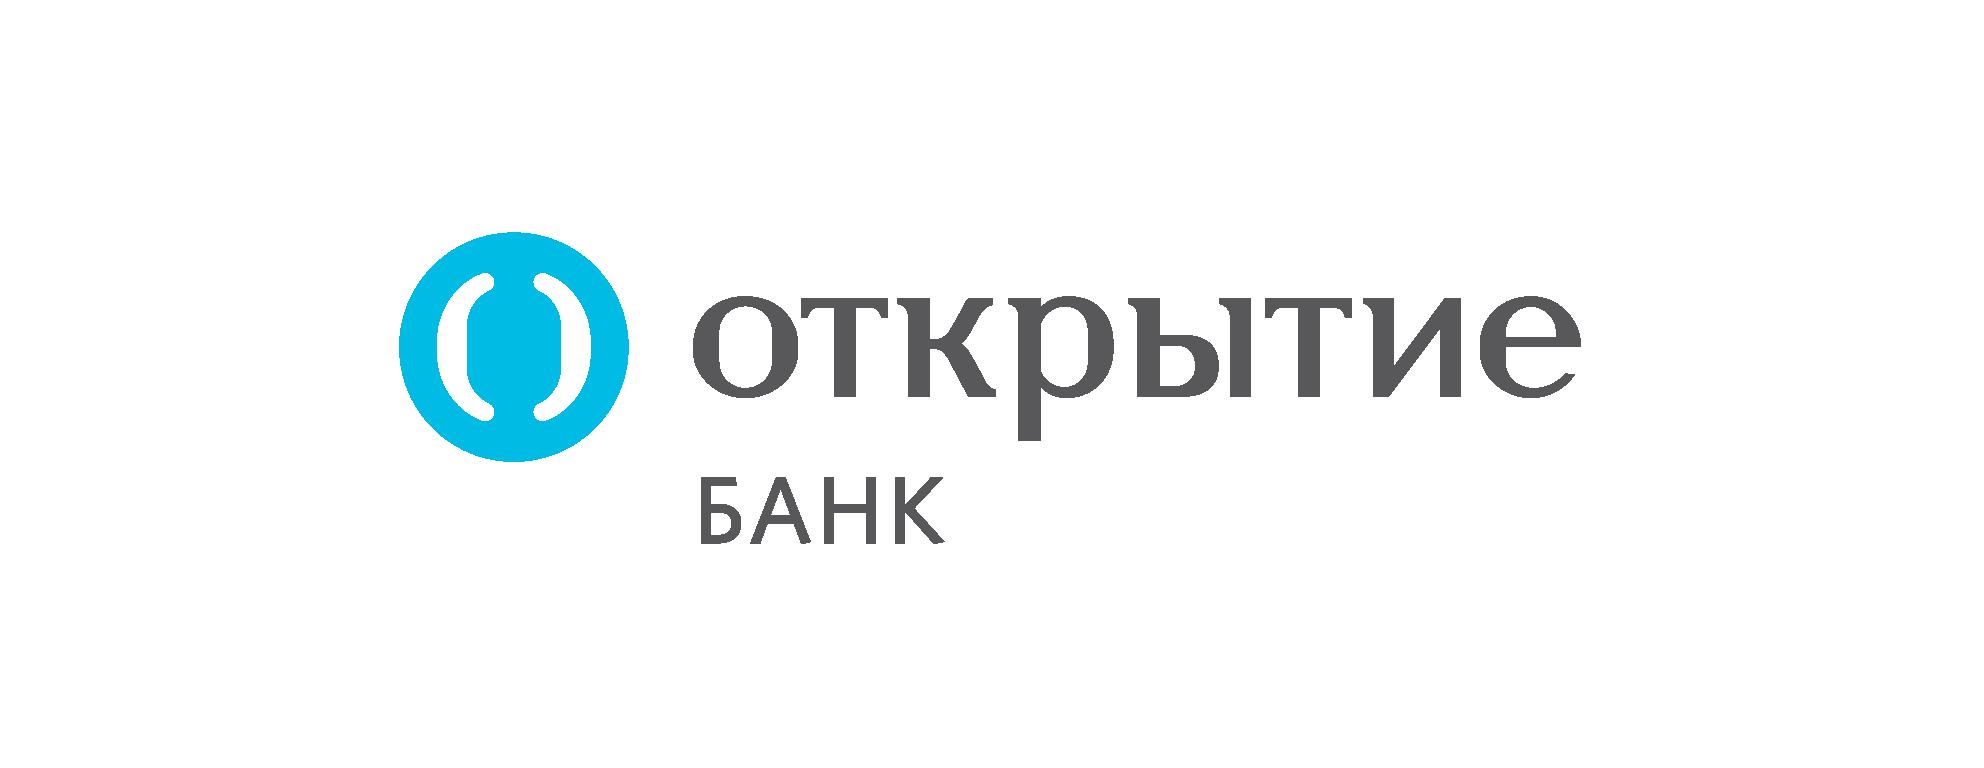 Транс капиталинвест банк